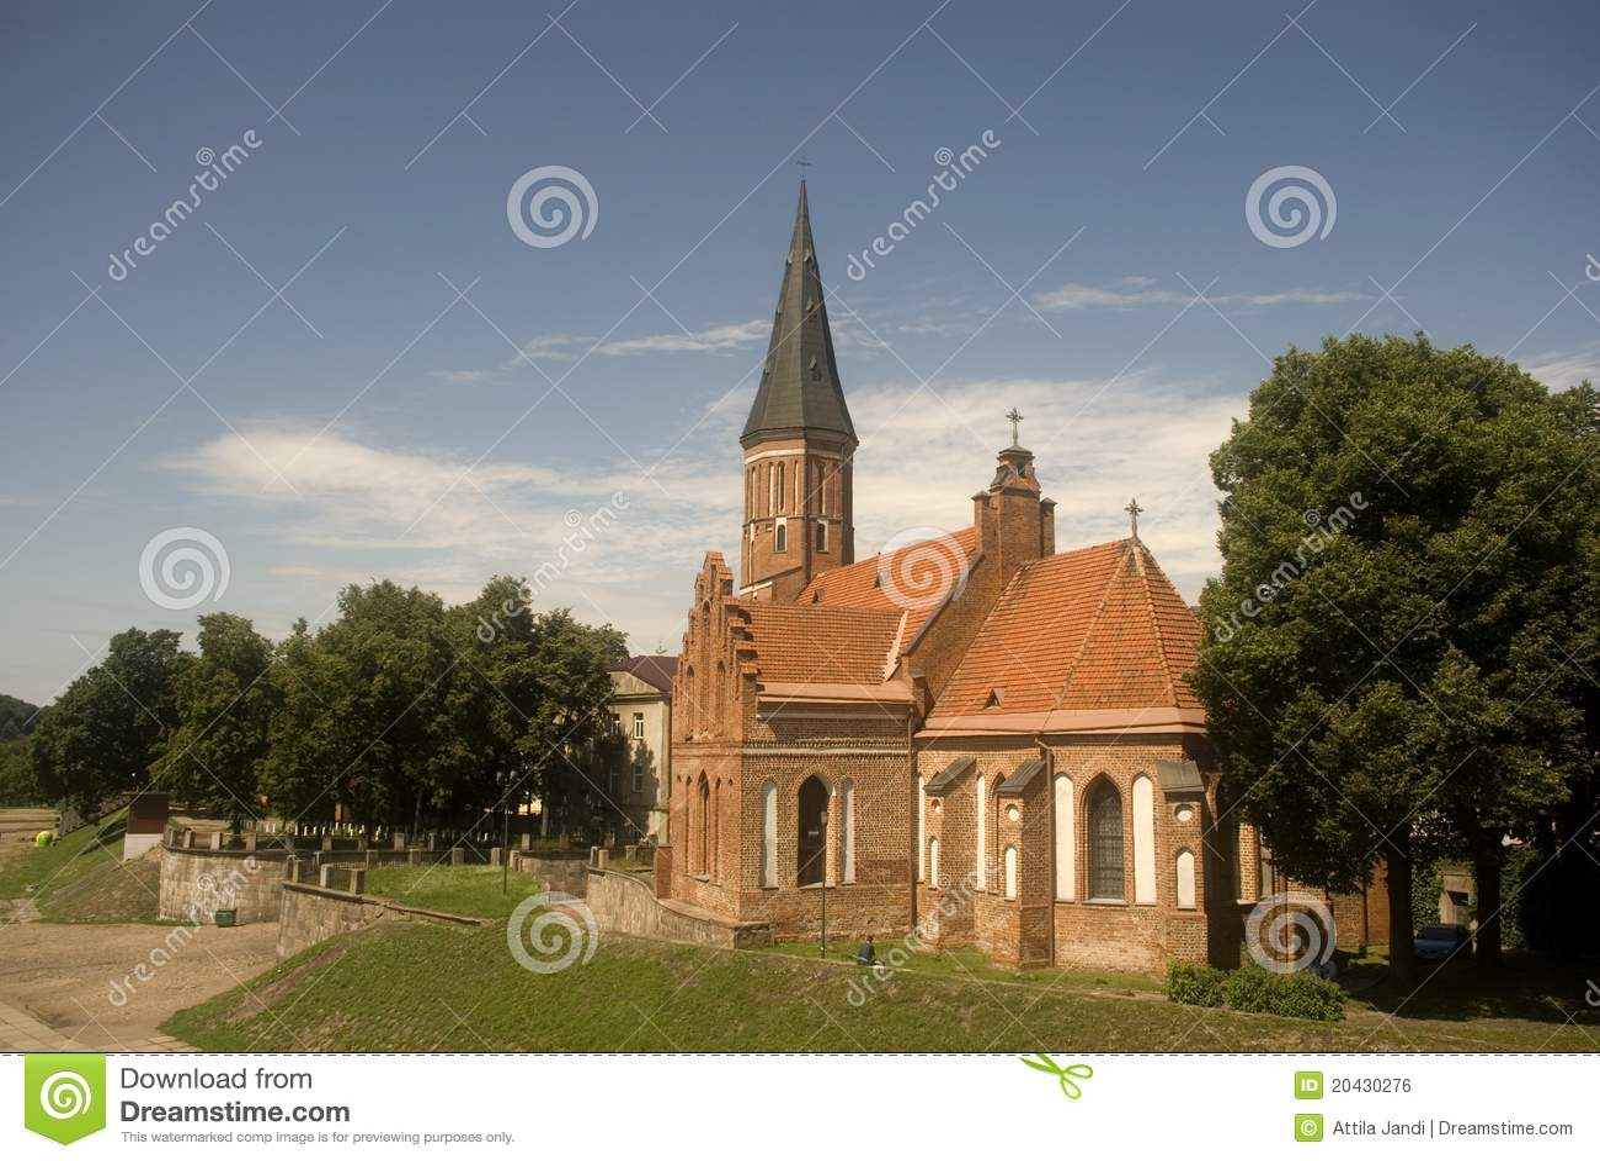 Vytautas Church, Kaunas, Lithuania